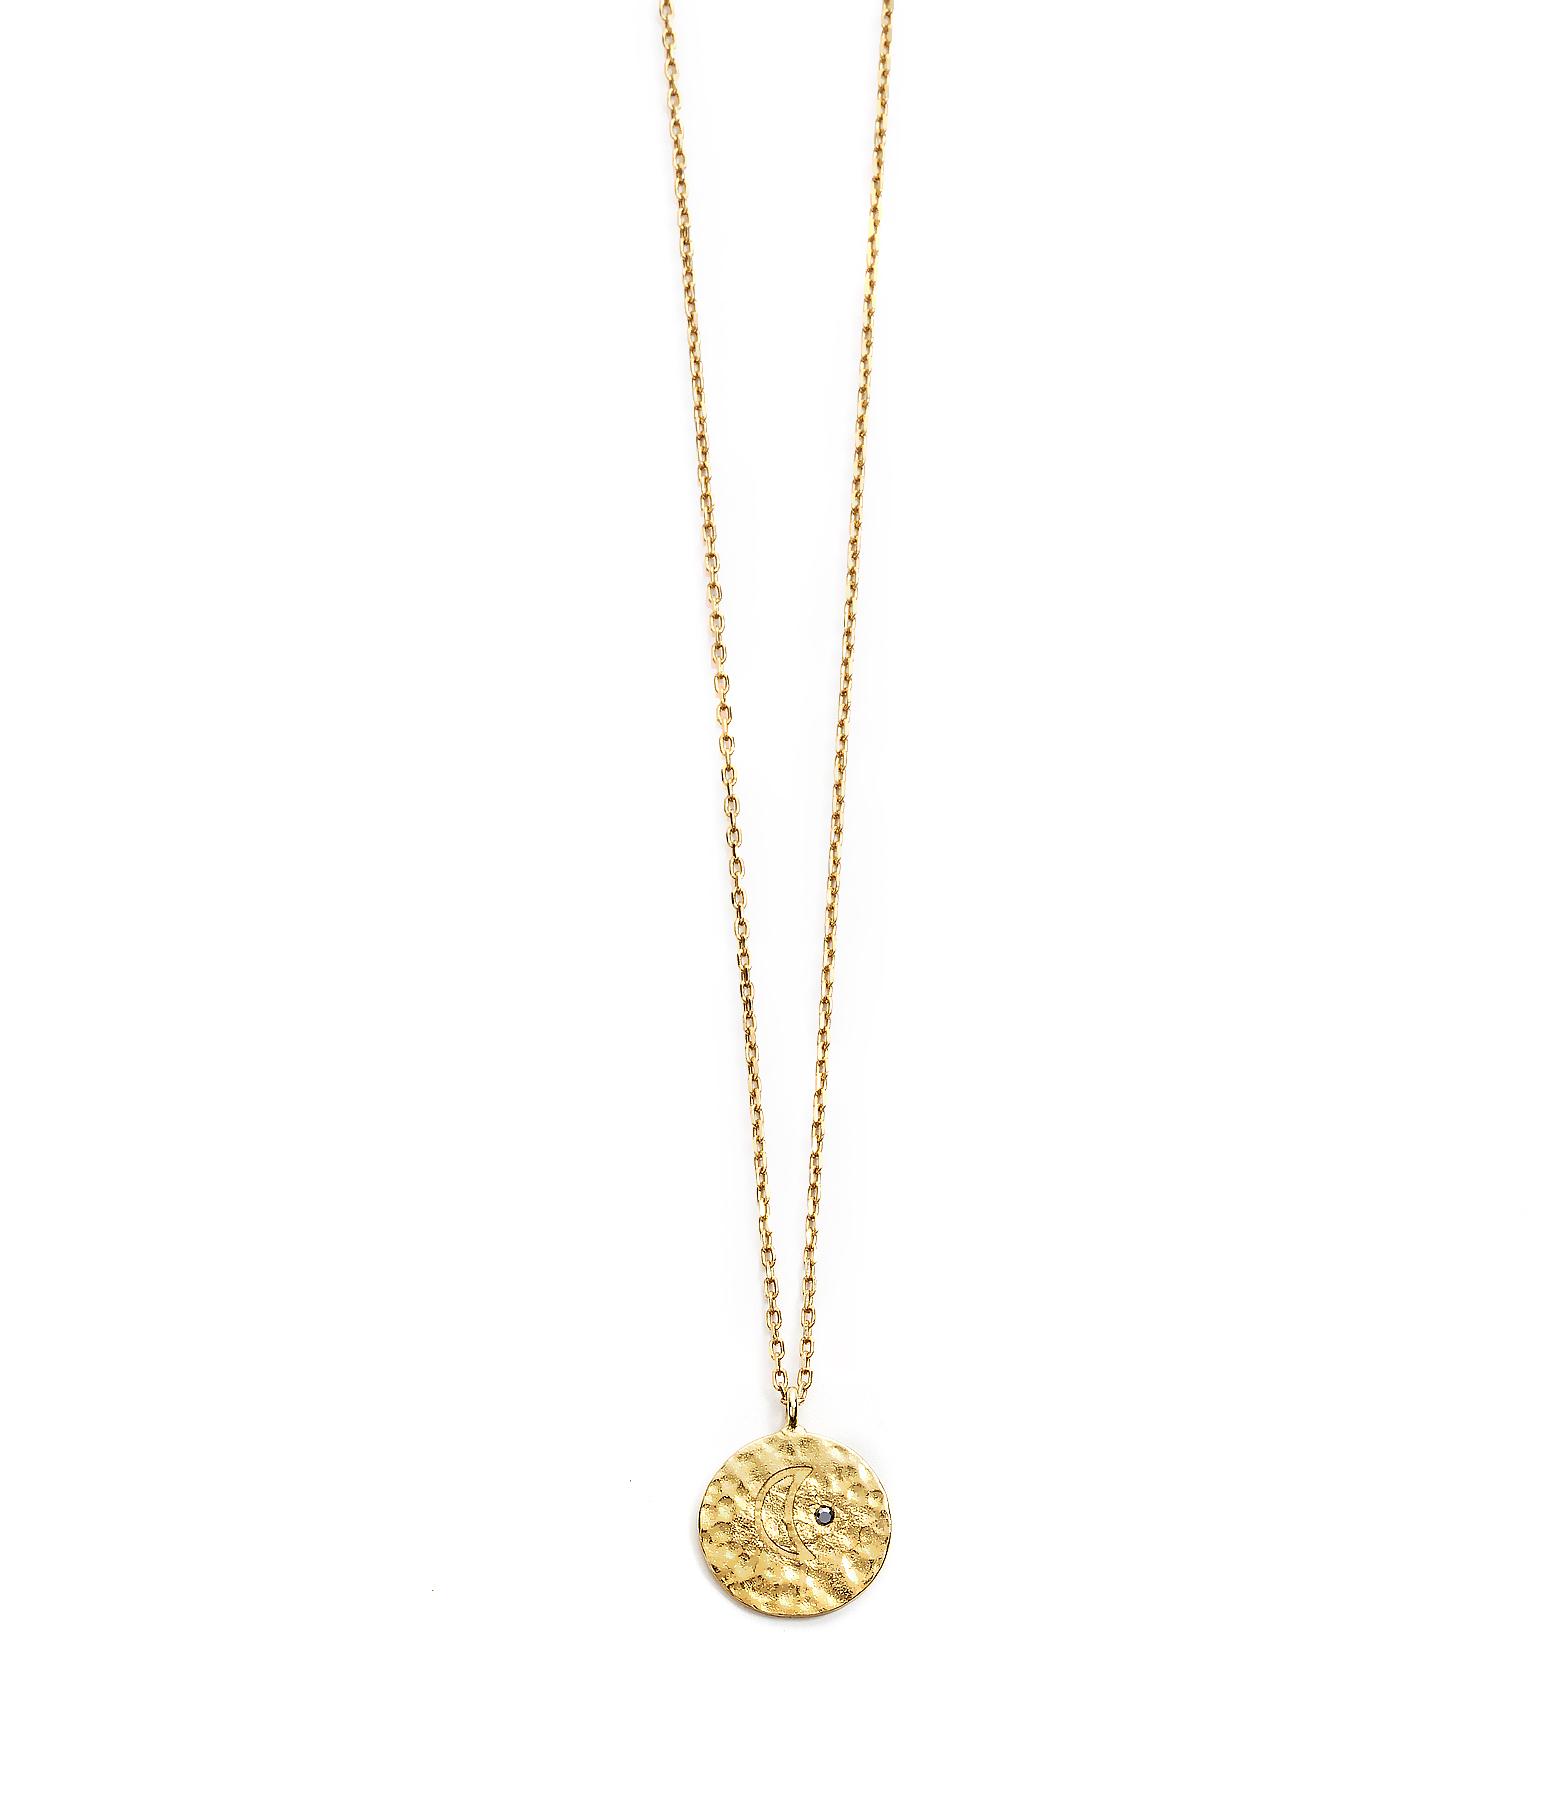 Collier Long Médaille Lune Ibiza 9K